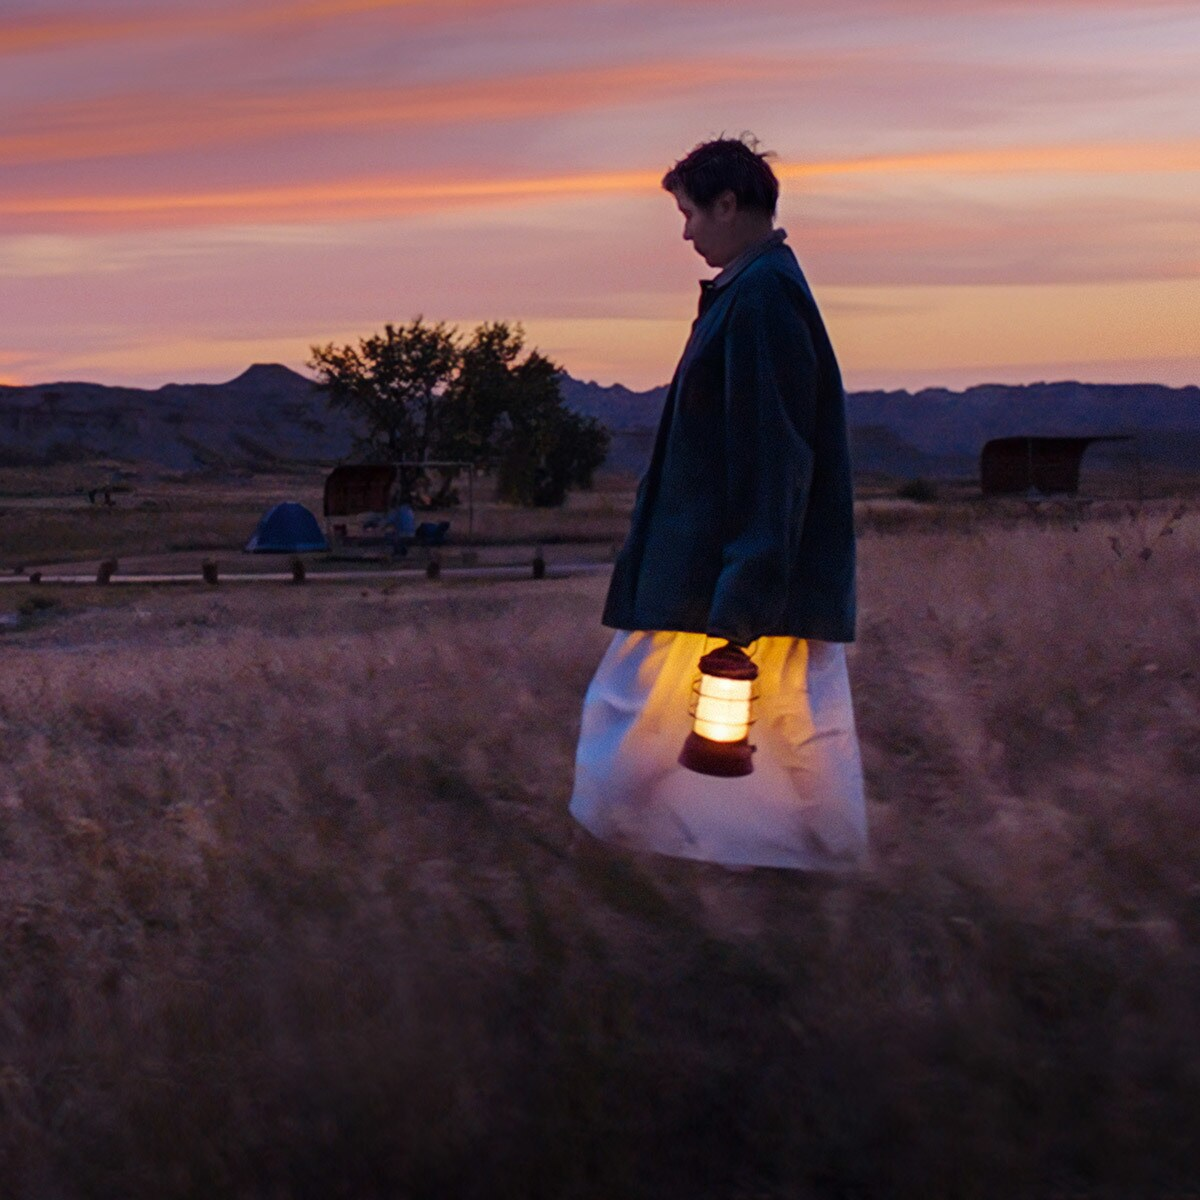 Frances McDormand in Nomadland. Stream on Star on Disney+